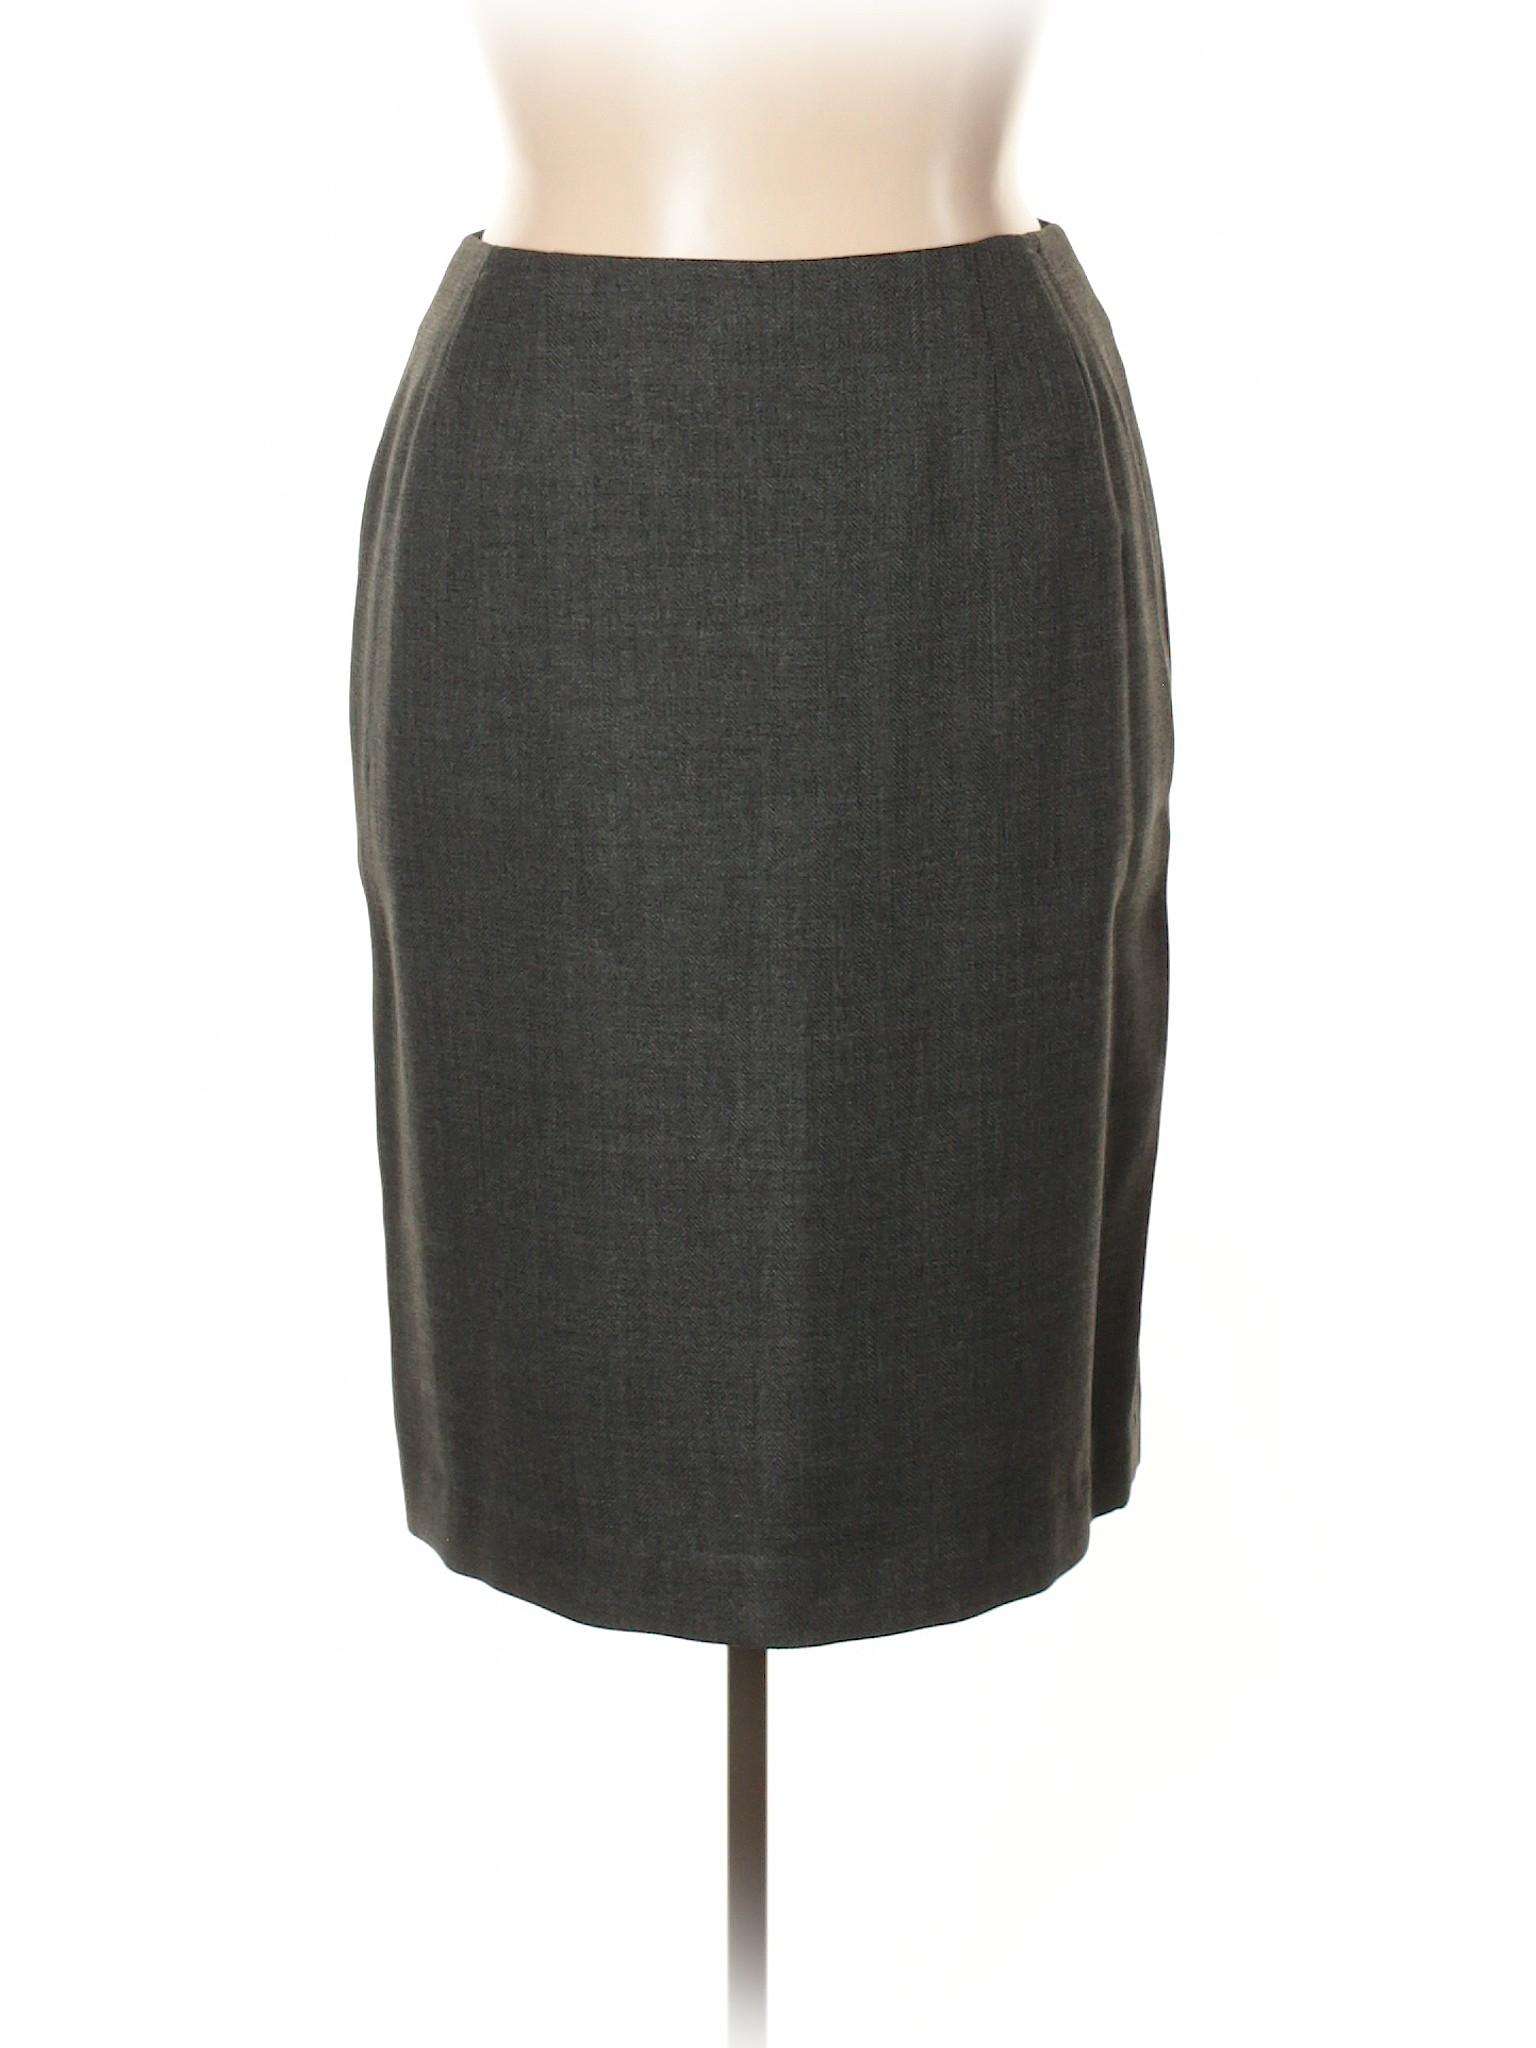 Skirt Casual Boutique Skirt Boutique Casual Boutique Boutique Skirt Casual w4pXSXq